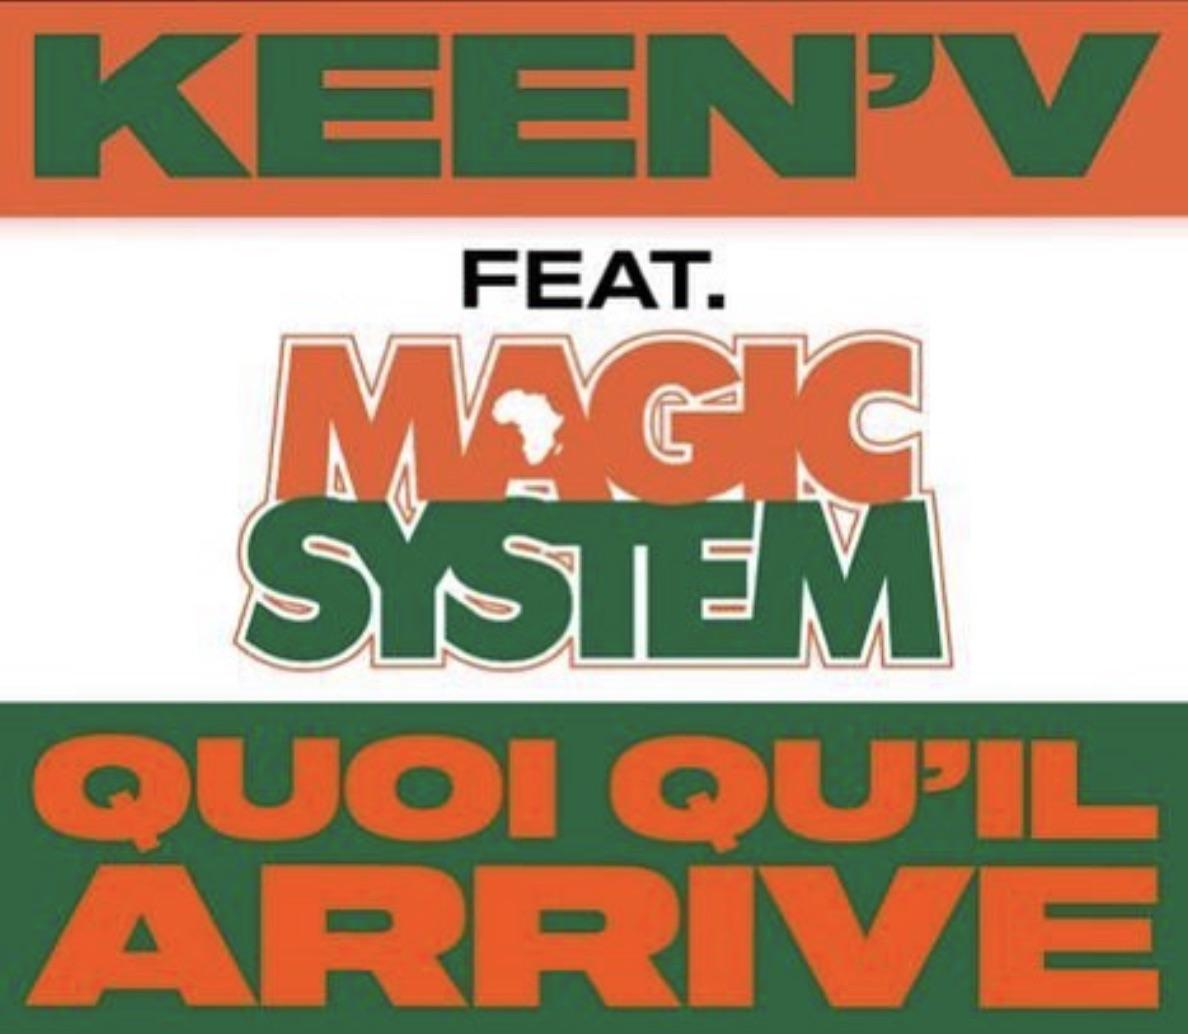 Keen'V - Magic system - Quoi qu'il arrive